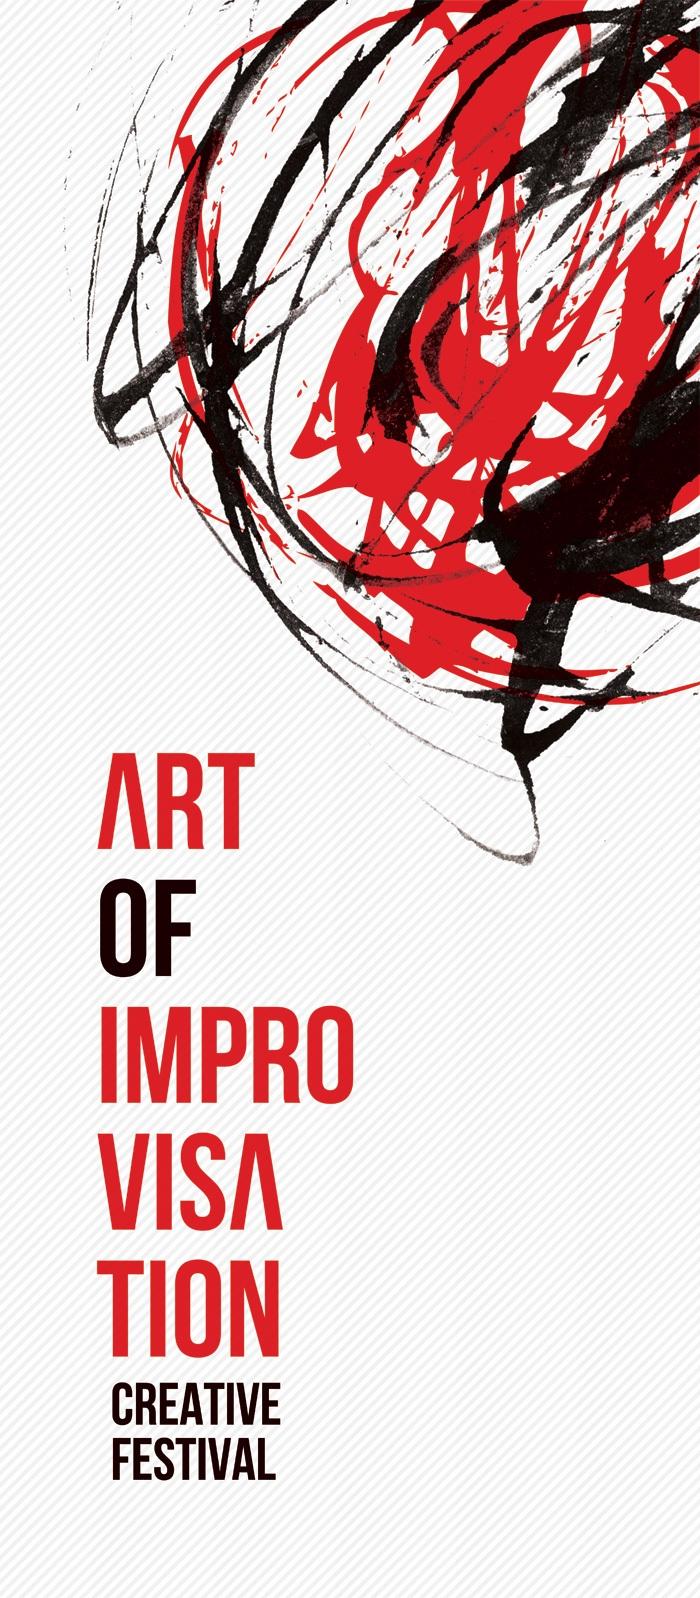 ART OF IMPROVISATION Creative Festival, logo (źródło: mat. prasowe)